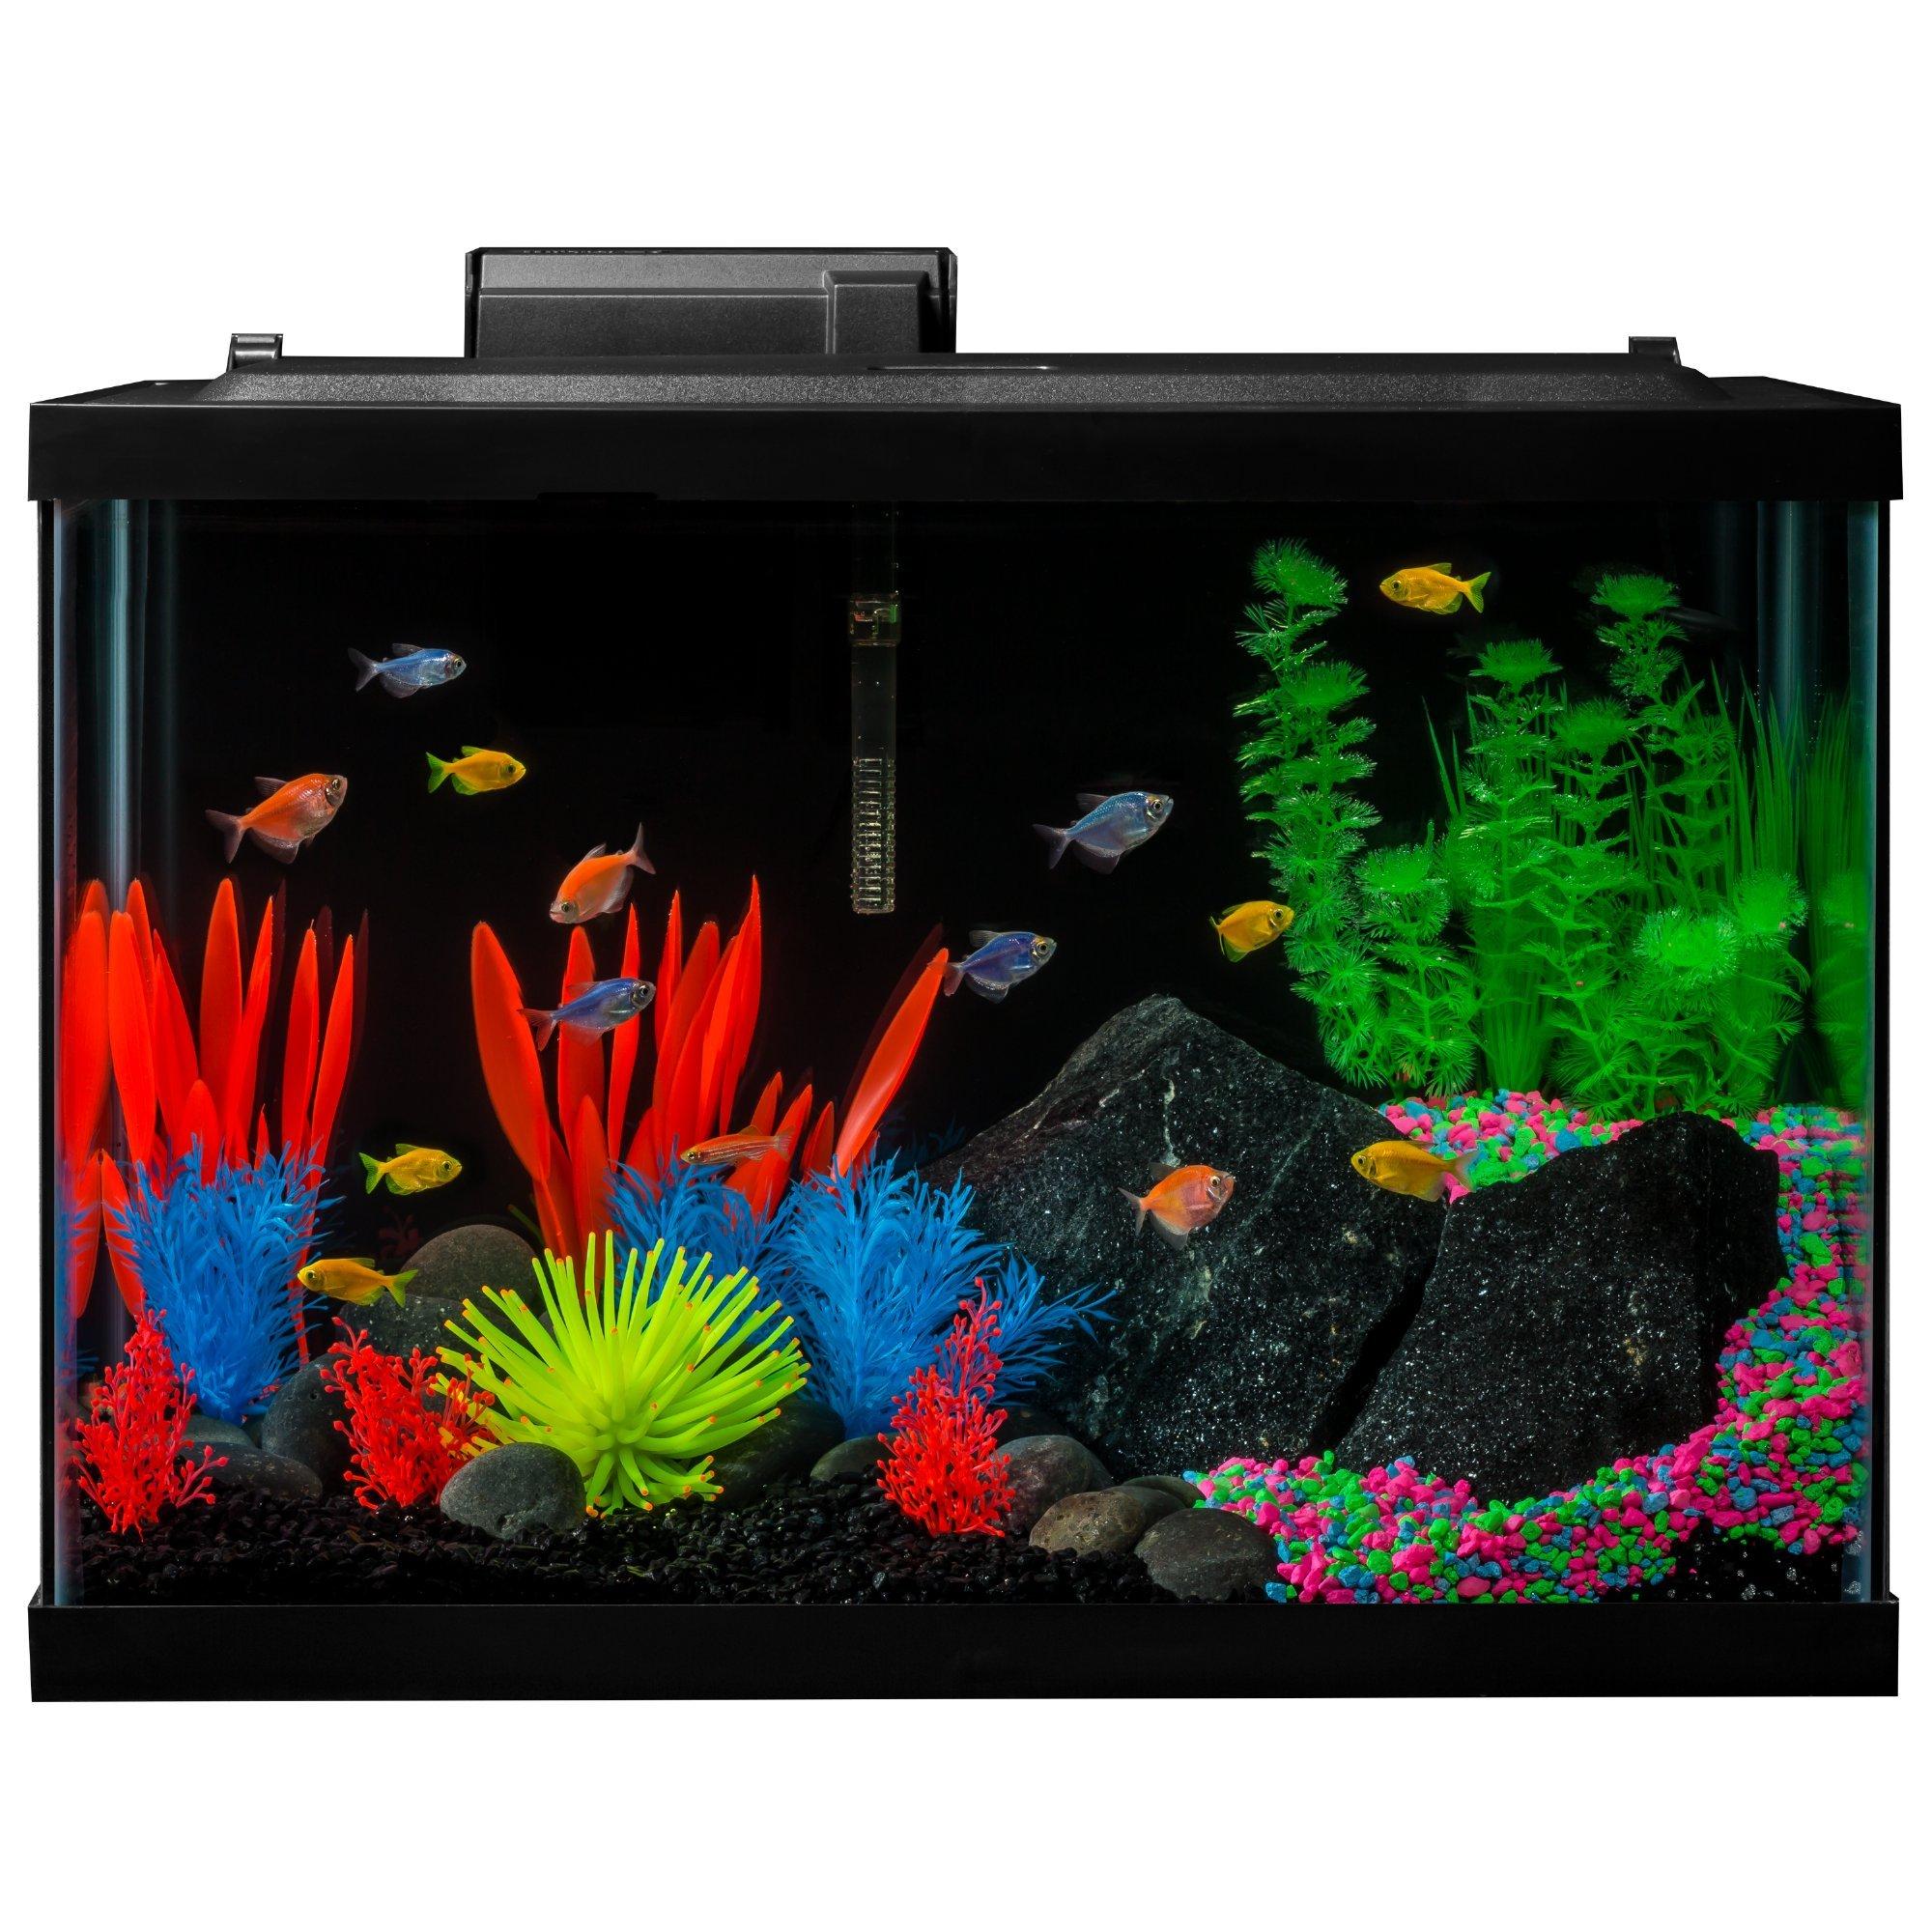 GloFish 20 Gallon Aquarium Kit with LED Lights, Decor Heater and Filter by GloFish